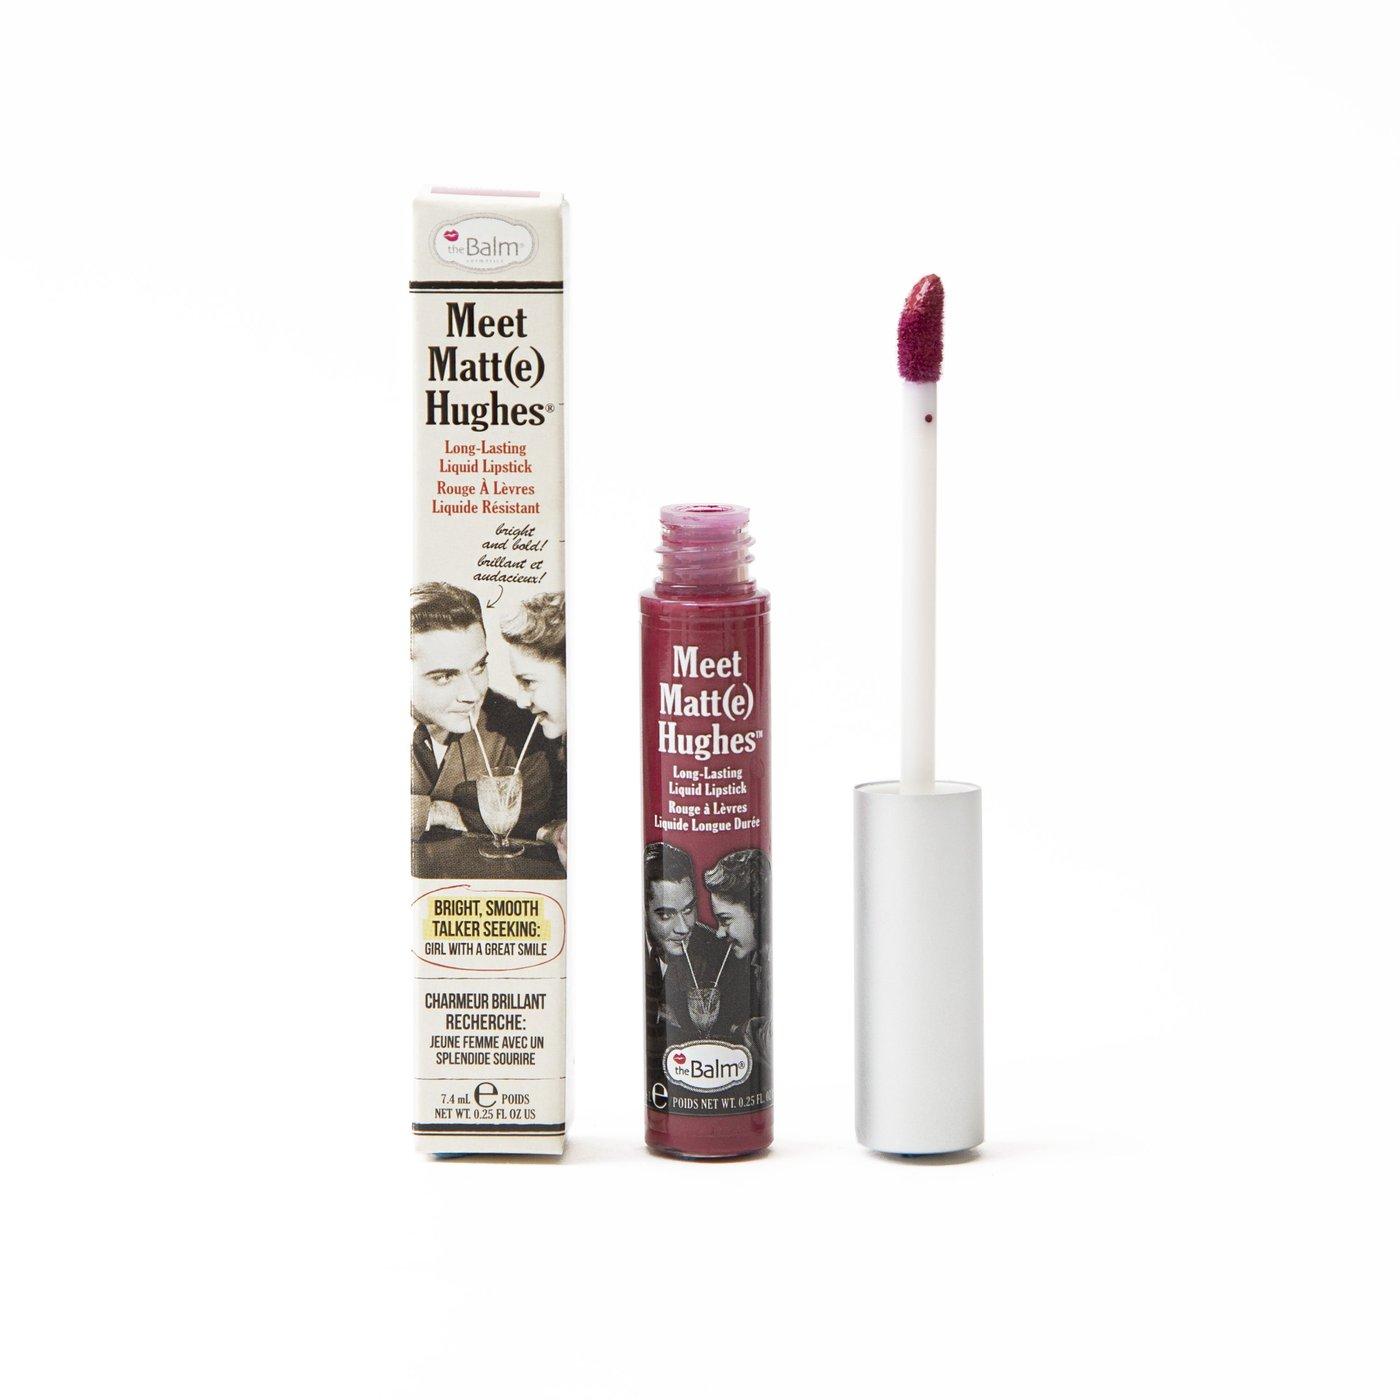 Meet Matte Hughes Long Lasting Liquid Lipstick - Dedicated